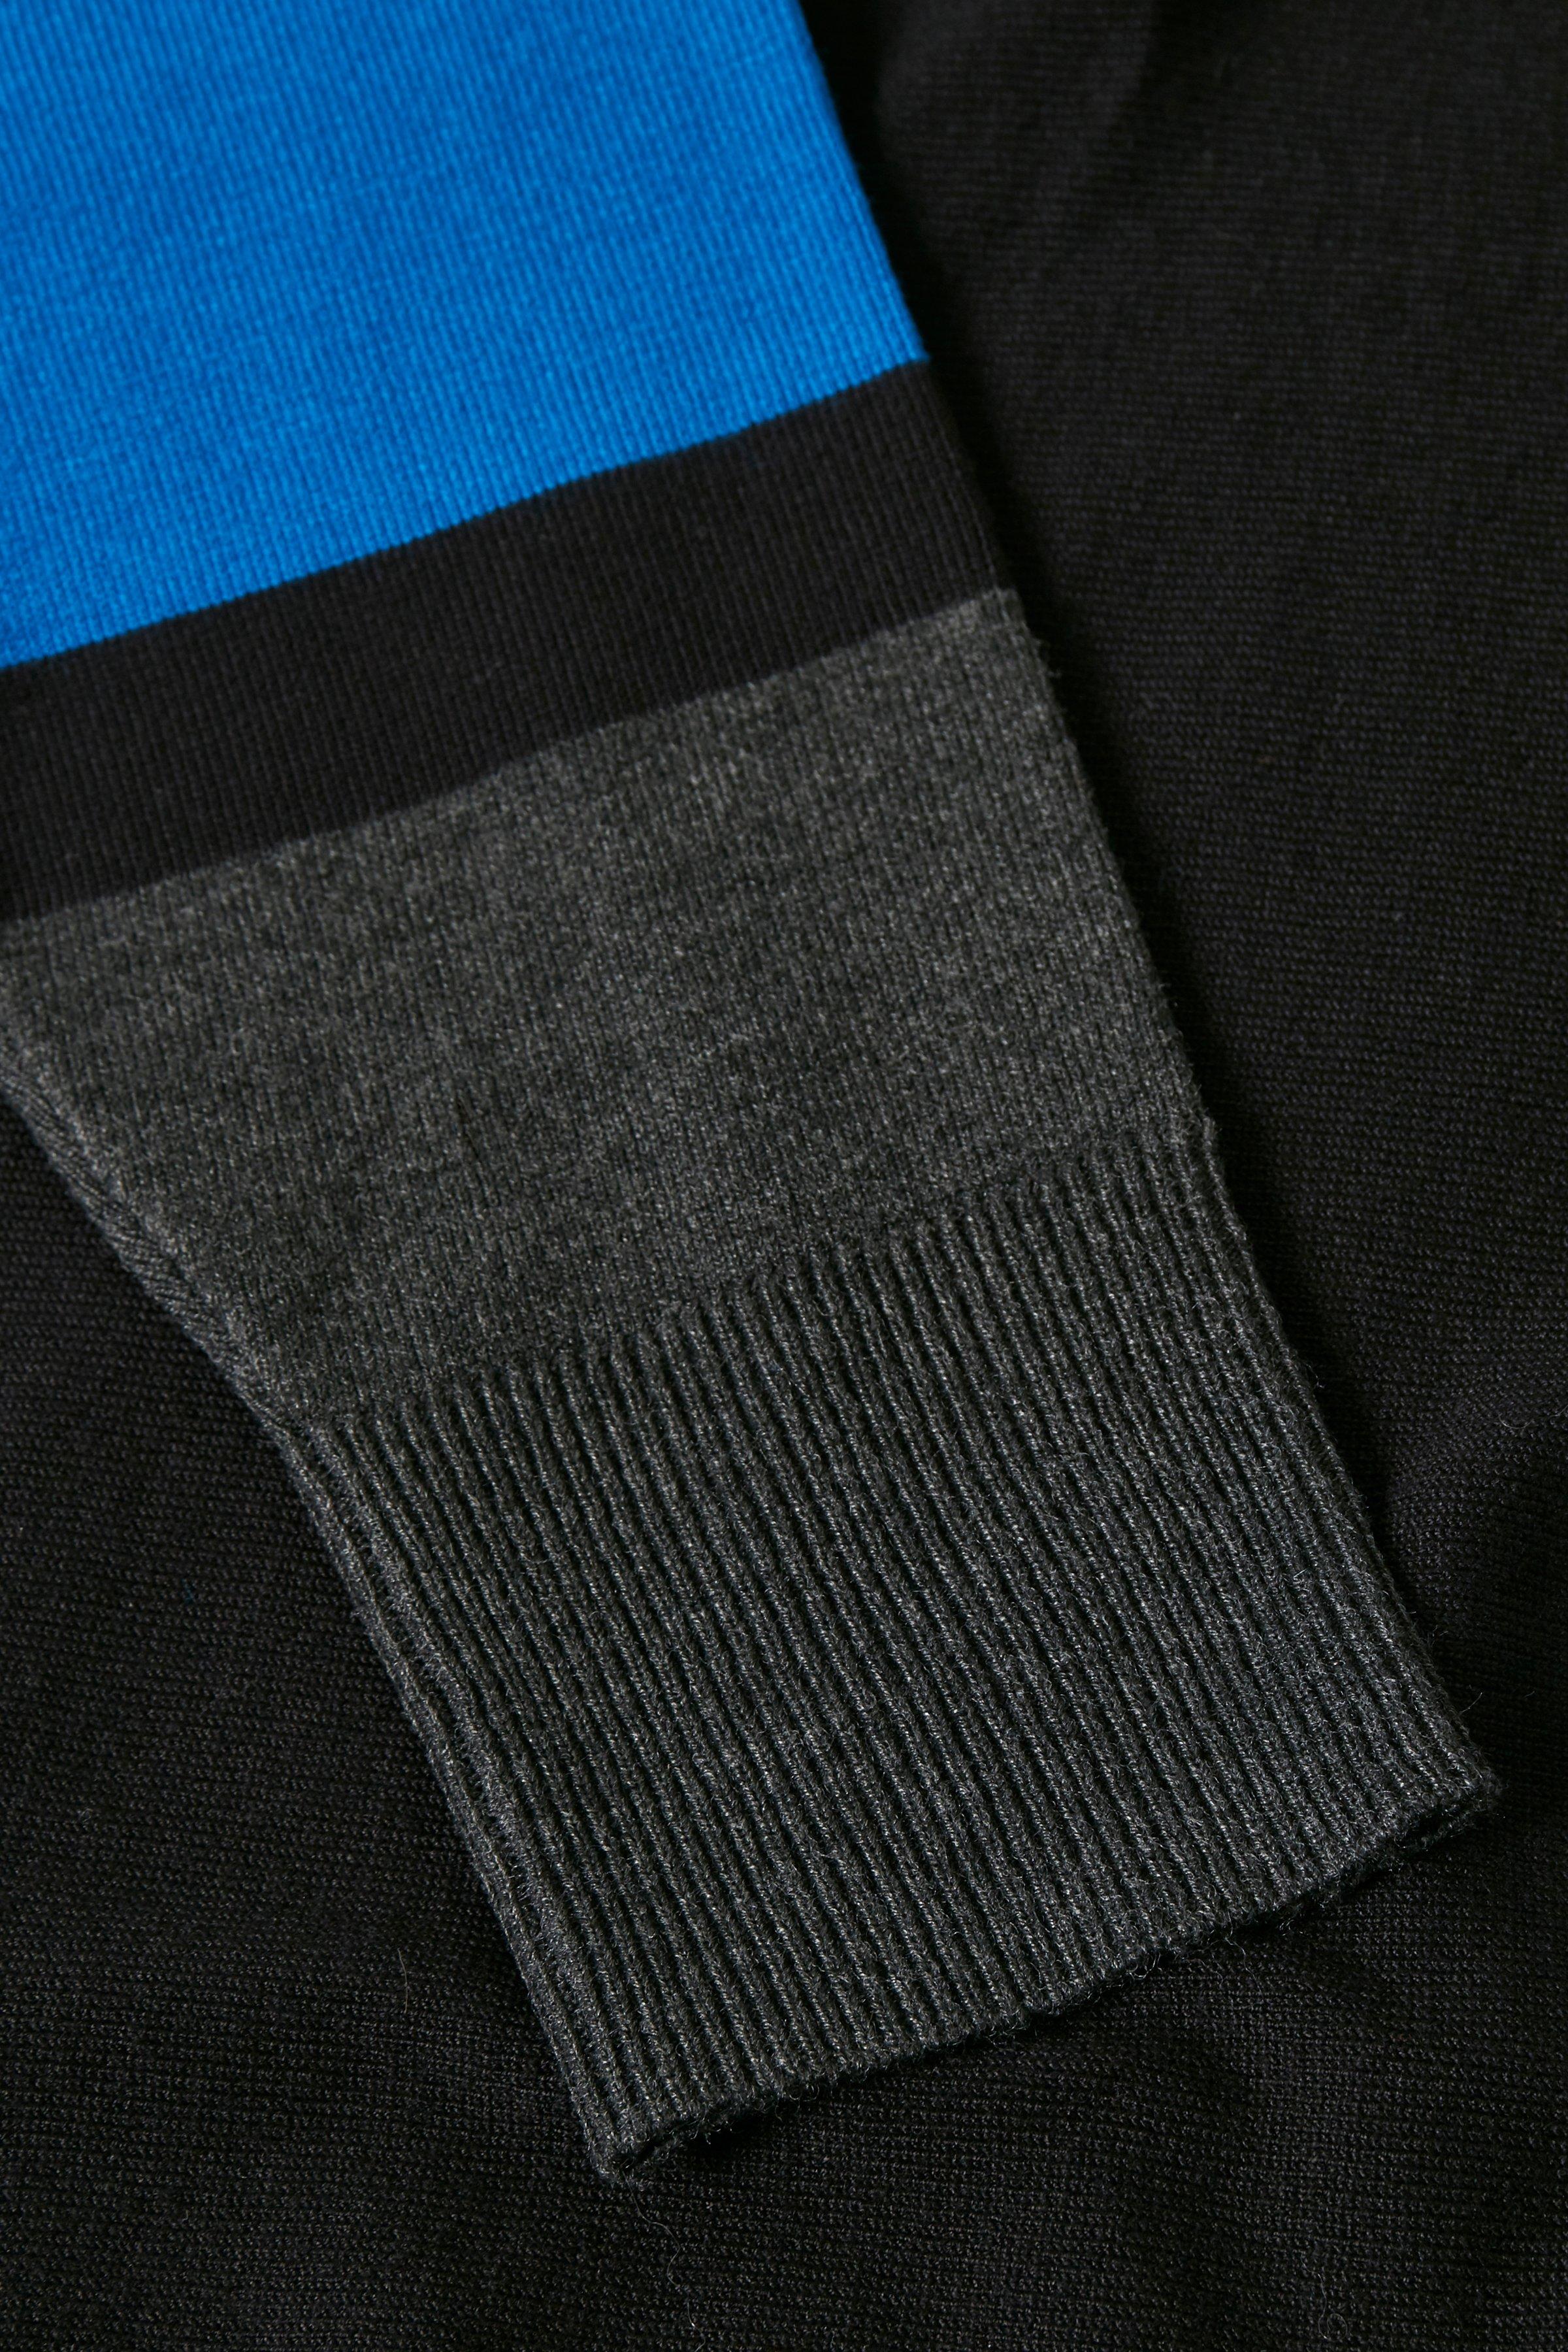 Svart/blå Stickad pullover från Bon'A Parte – Köp Svart/blå Stickad pullover från stl. S-2XL här